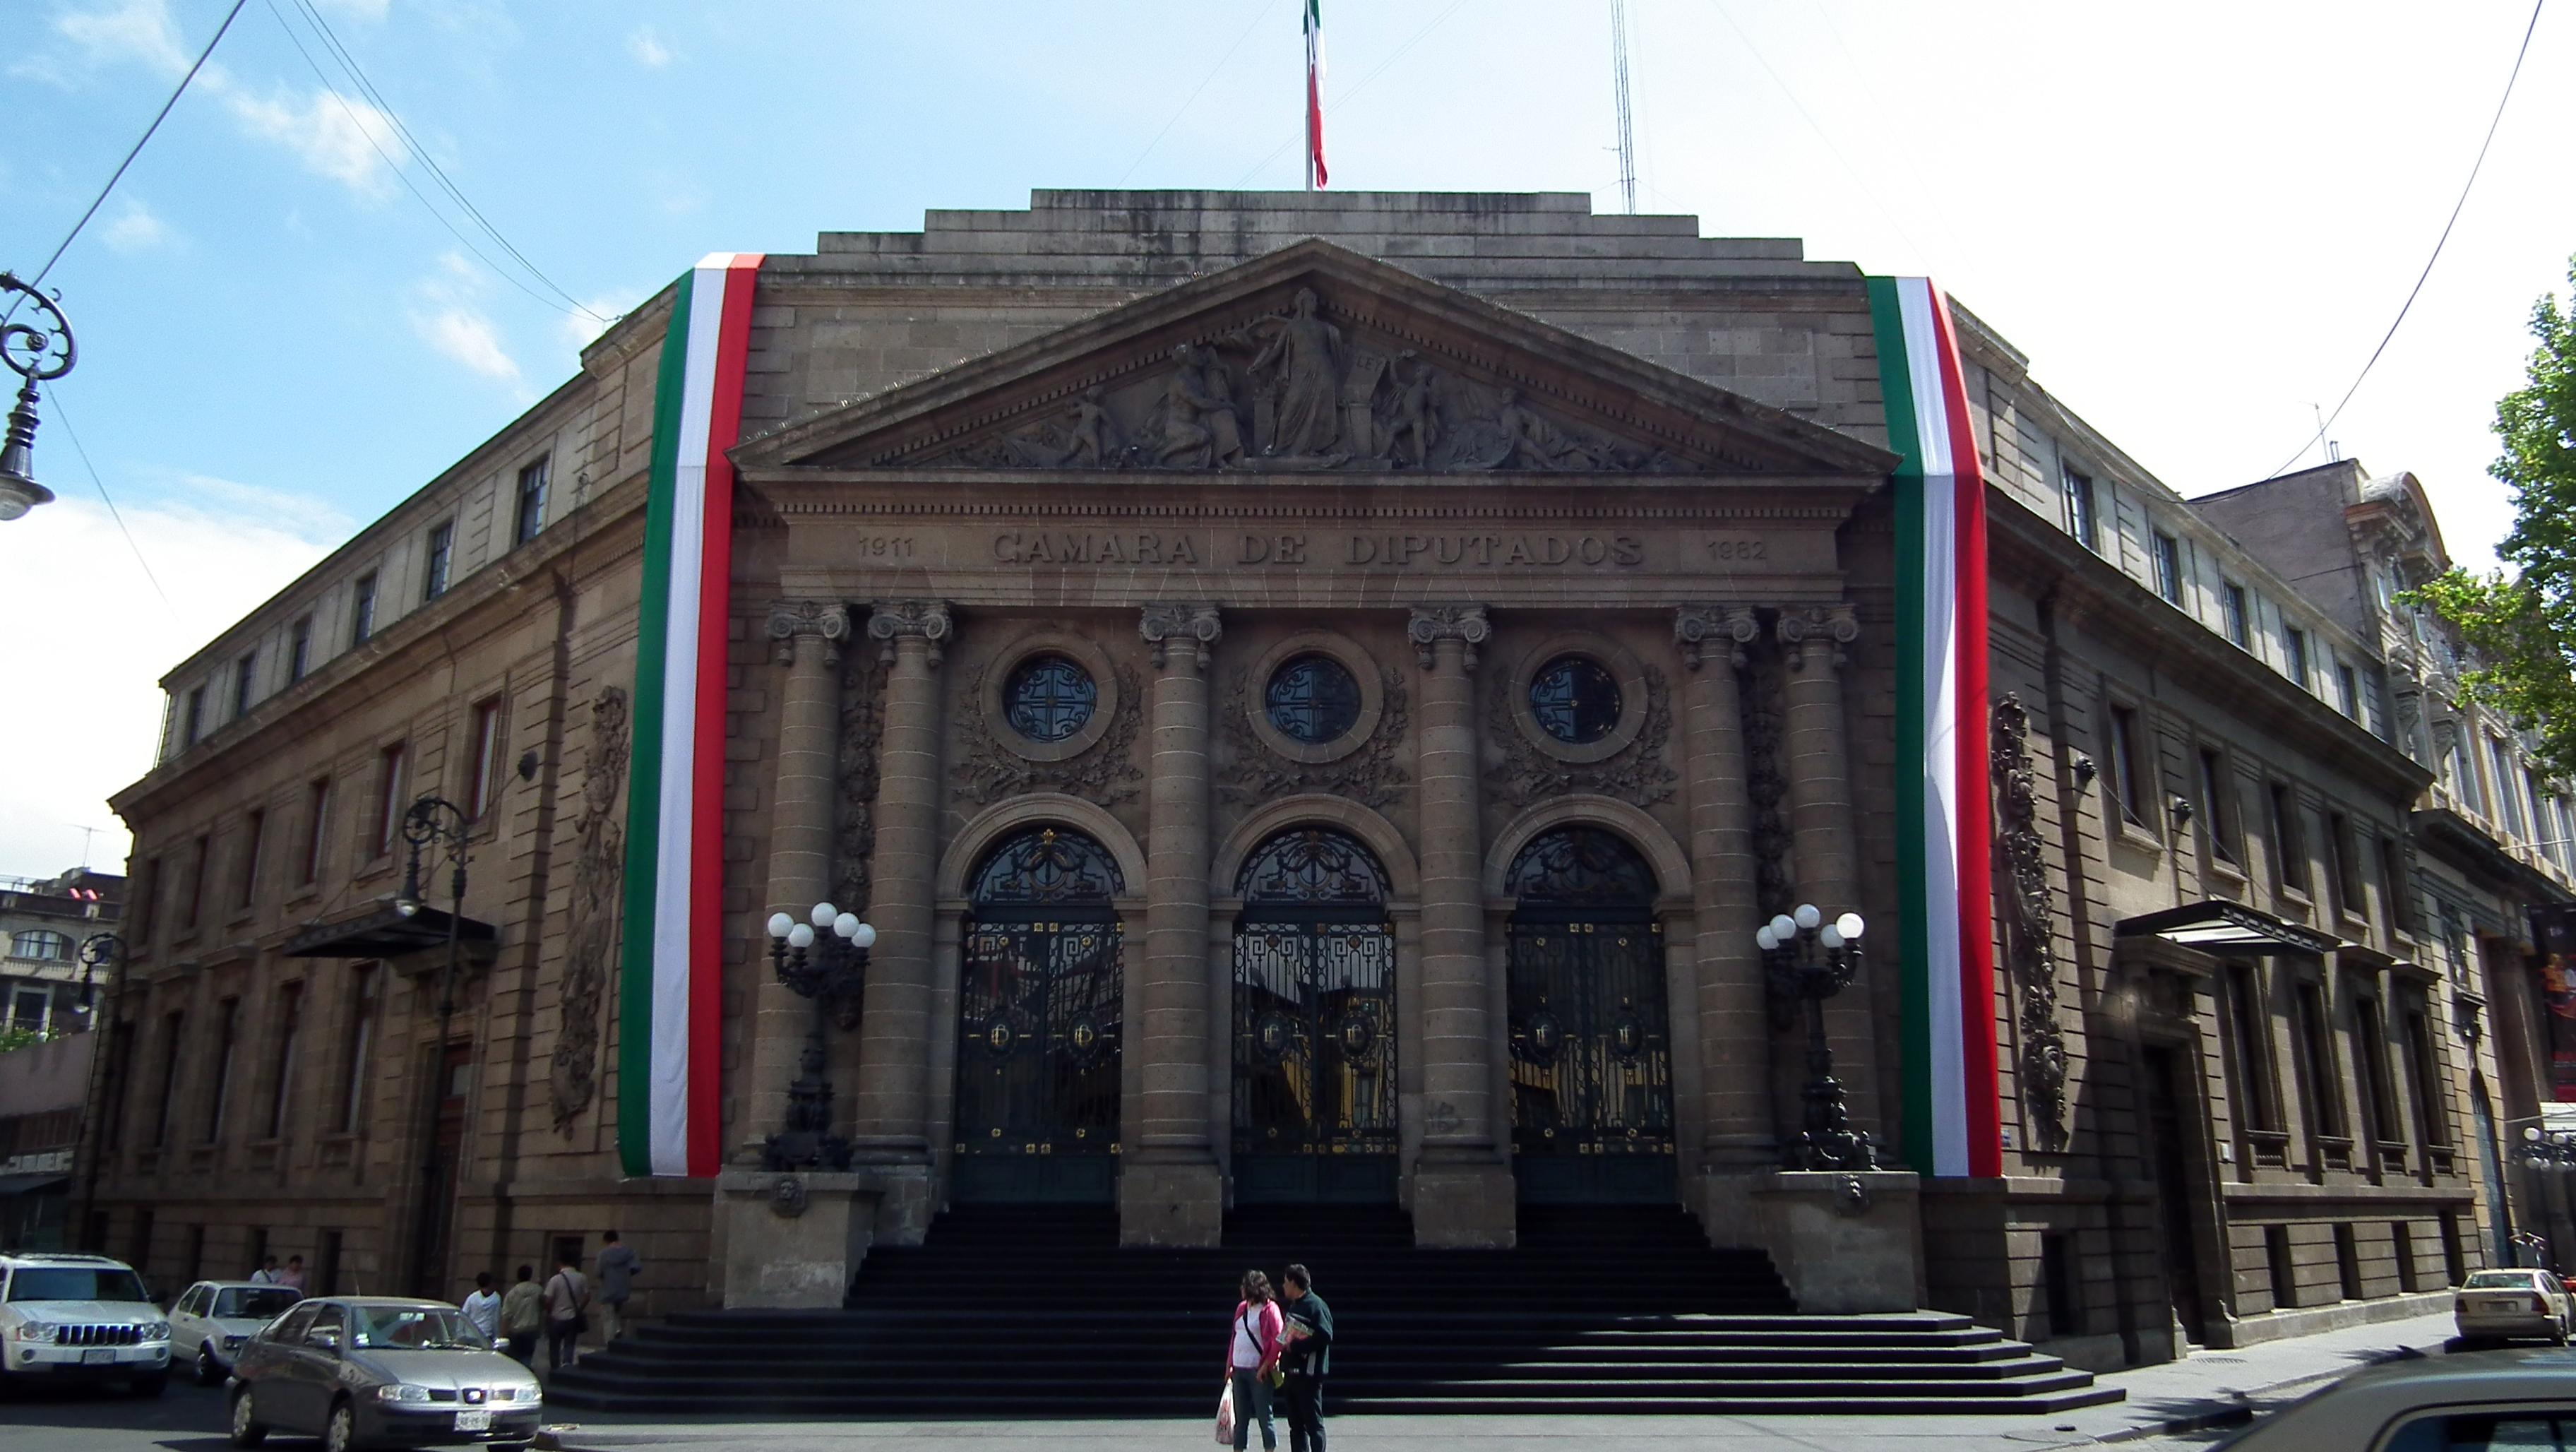 Asamblea Distrito Federal Del Distrito Federal 1.jpg